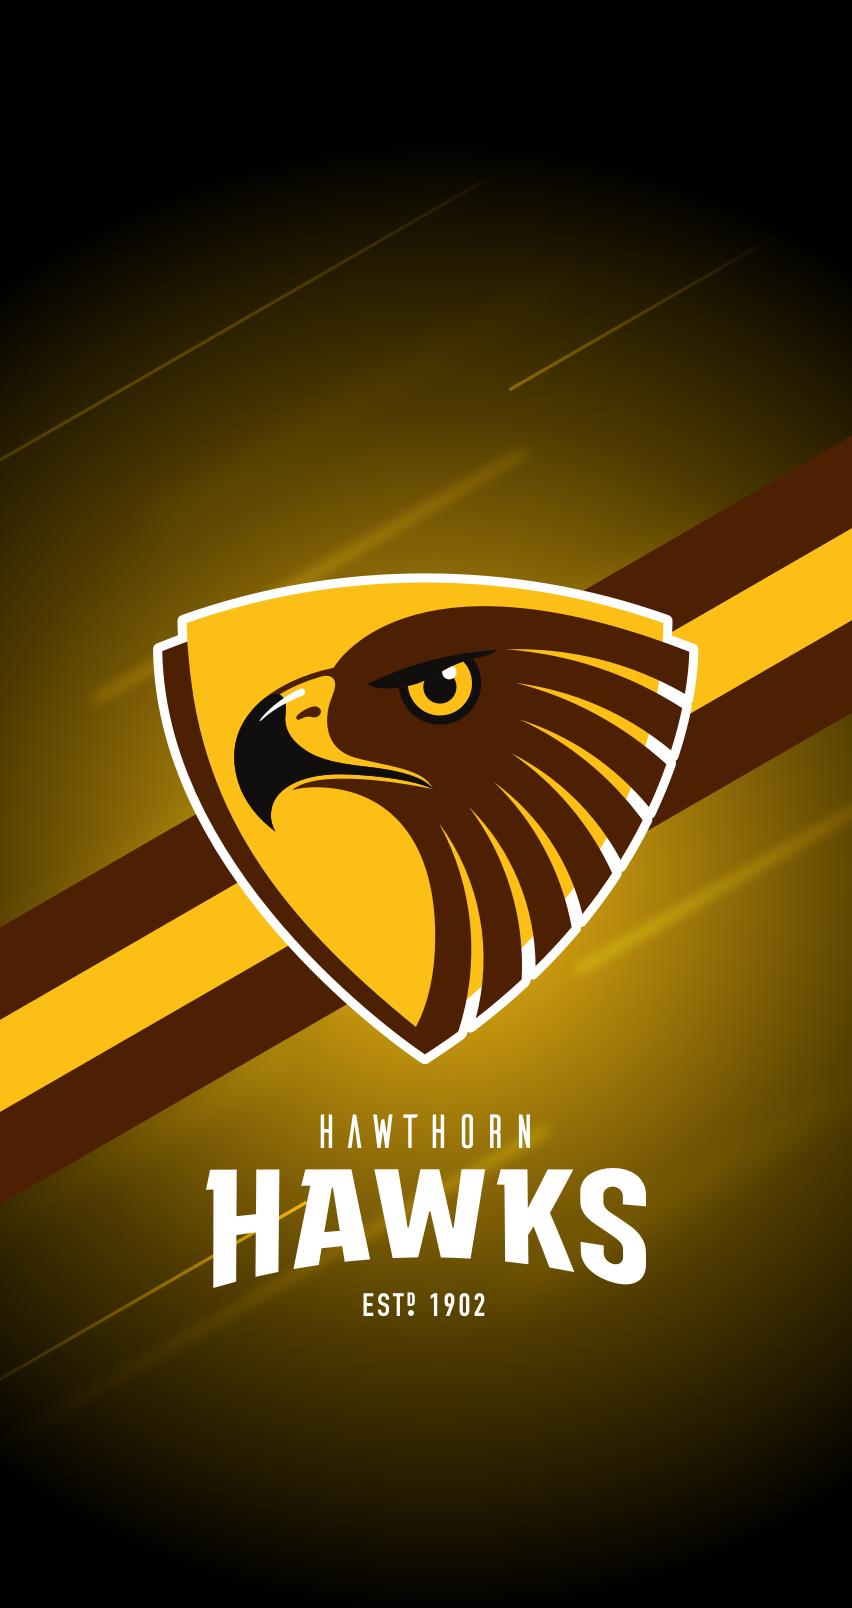 Hawthorn Hawks Iphone 6 7 8 Lock Screen Wallpaper In 2020 Hawthorn Hawks Lock Screen Wallpaper Screen Wallpaper